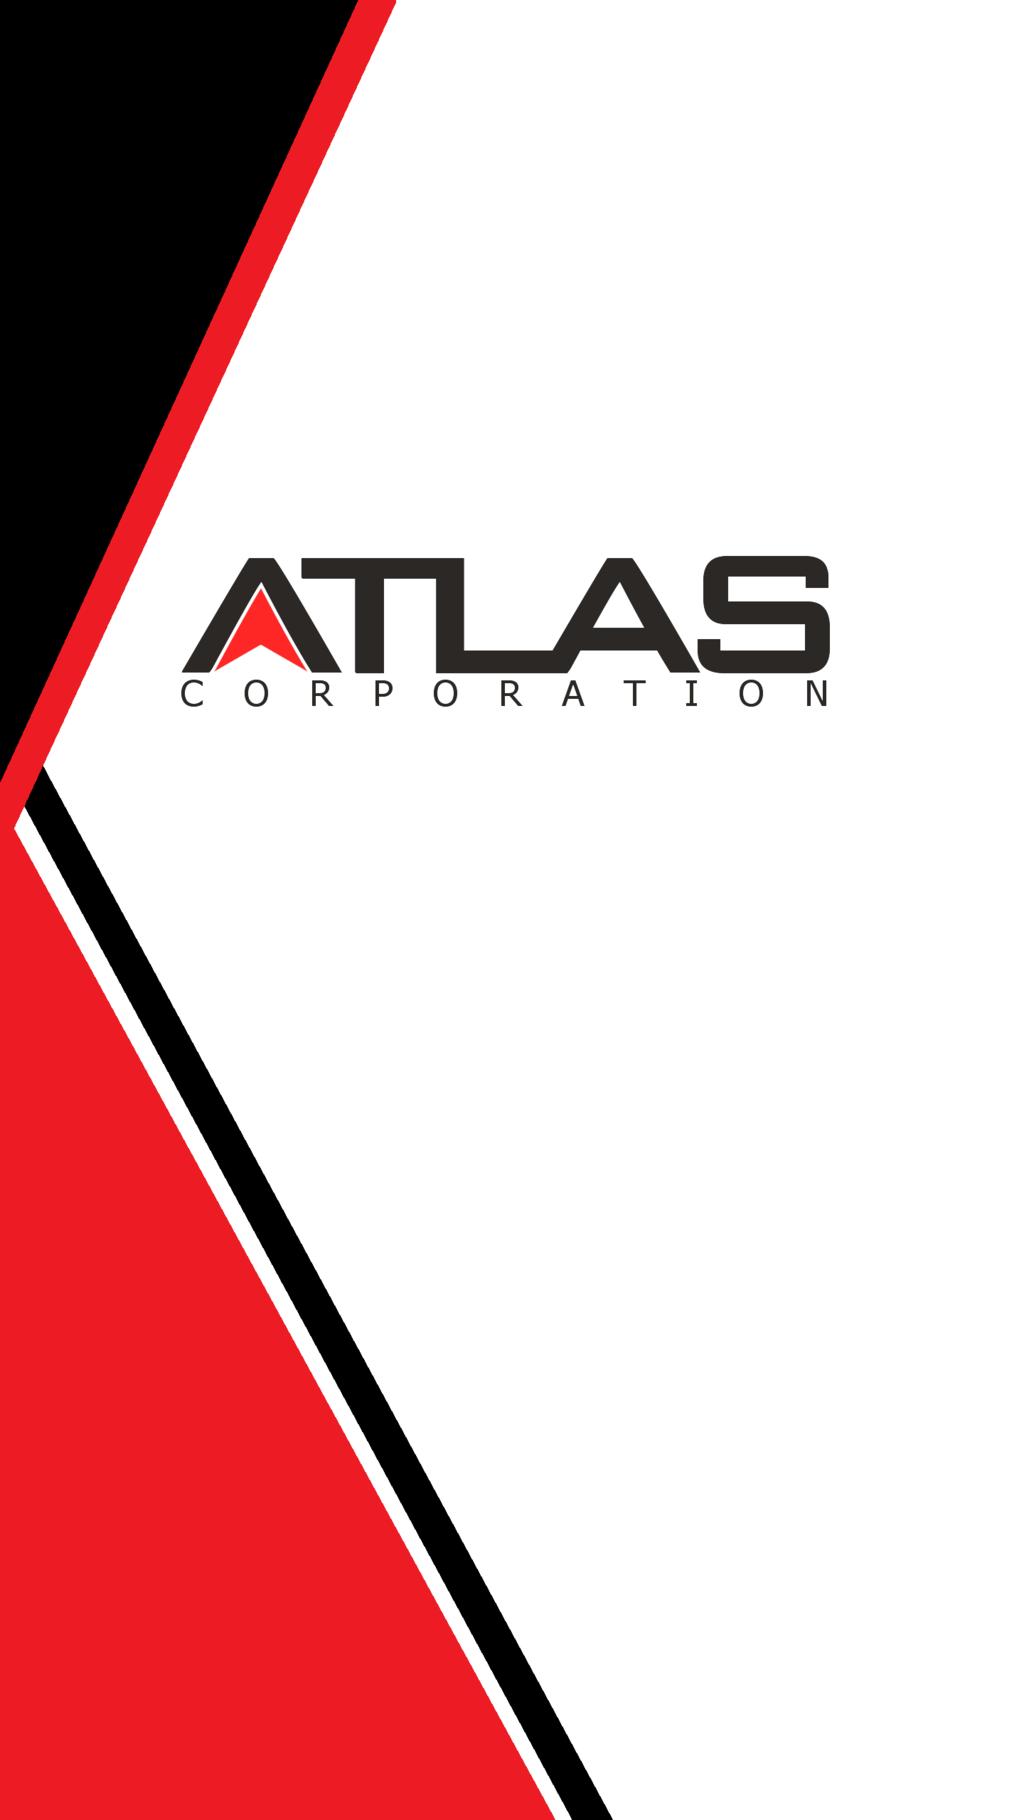 [49+] Call of Duty Atlas Wallpaper on WallpaperSafari